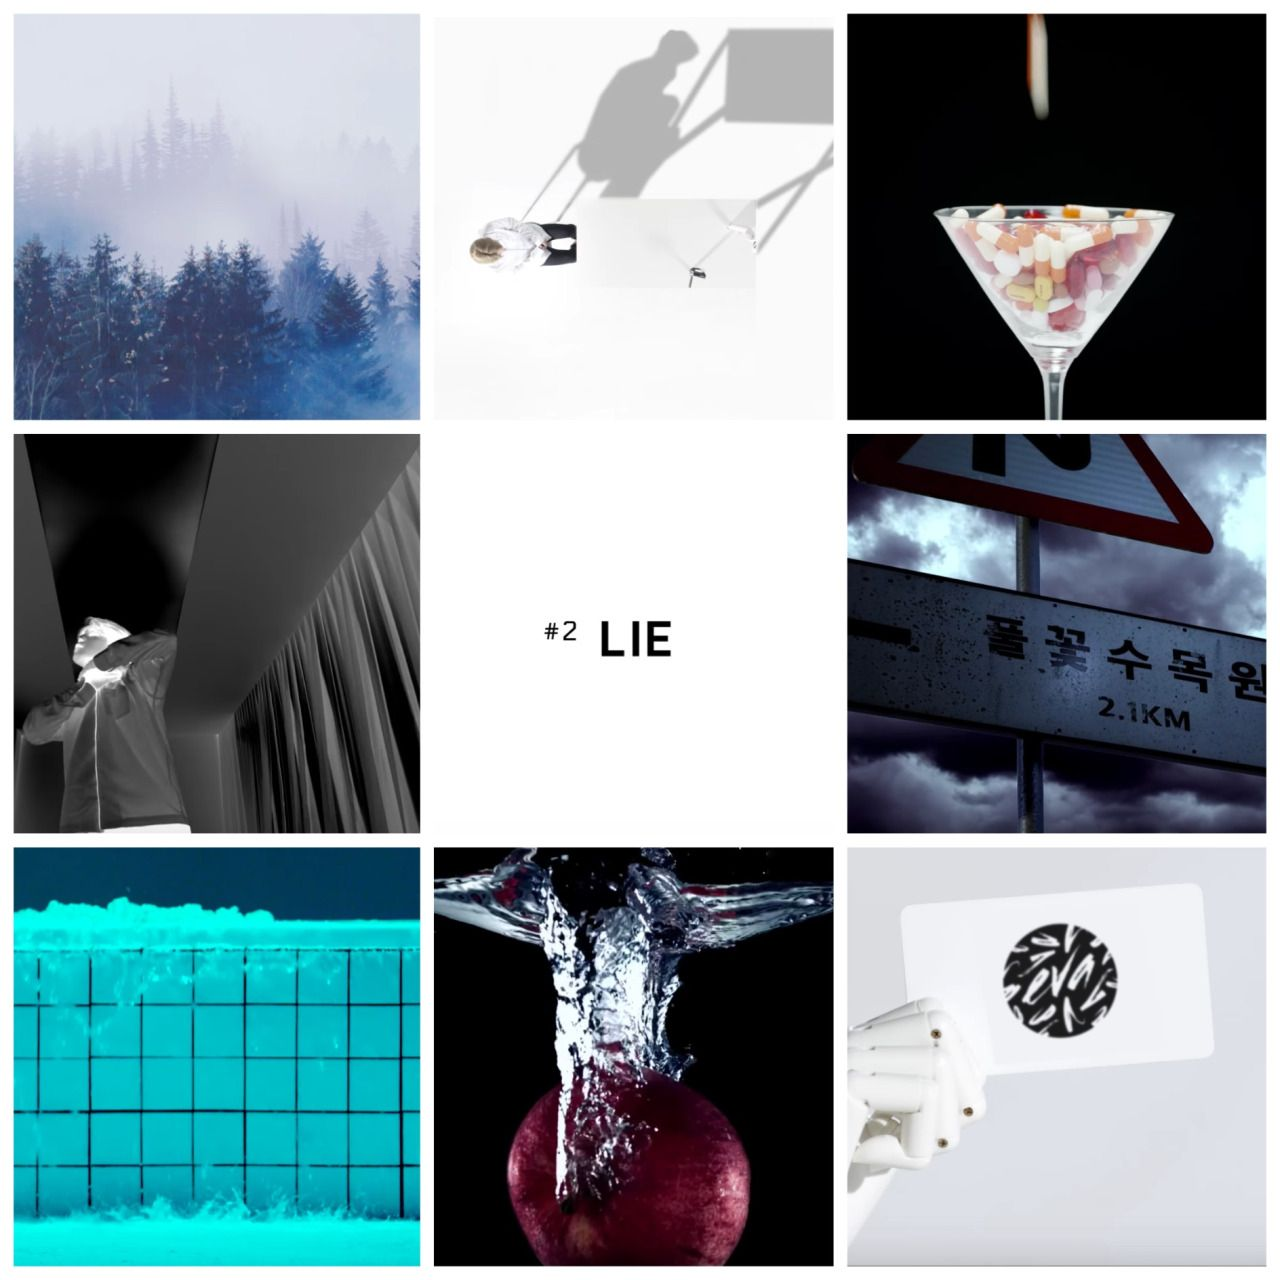 Jimin ❤ BTS (방탄소년단) WINGS Short Film #2 LIE #BTS #방탄소년단